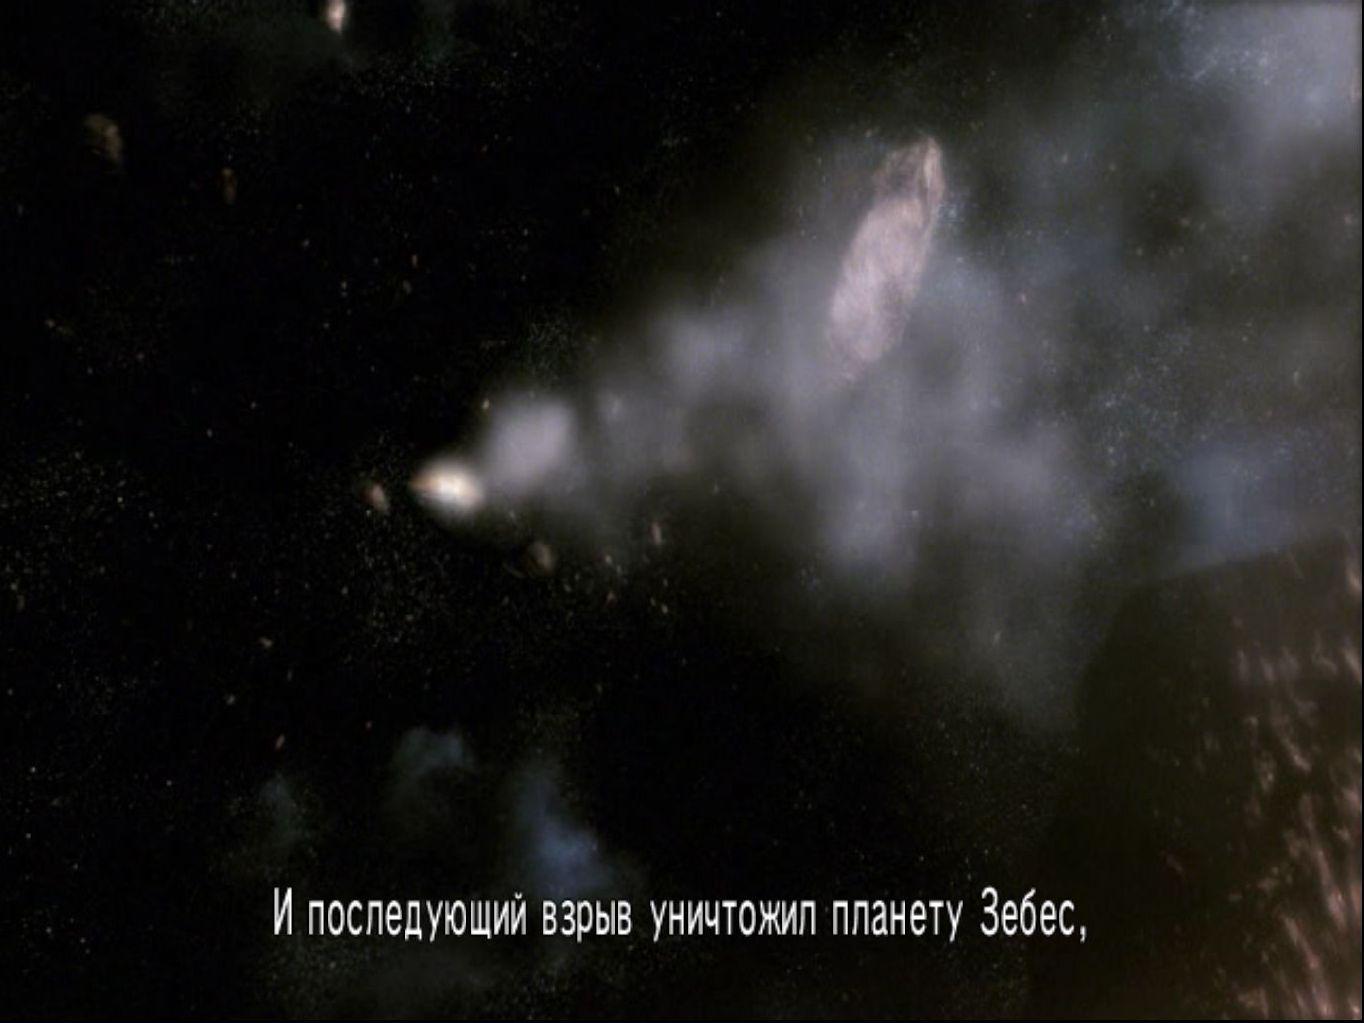 http://i1.imageban.ru/out/2014/04/17/18184306d8dd34adf108d8c915b19d13.jpg